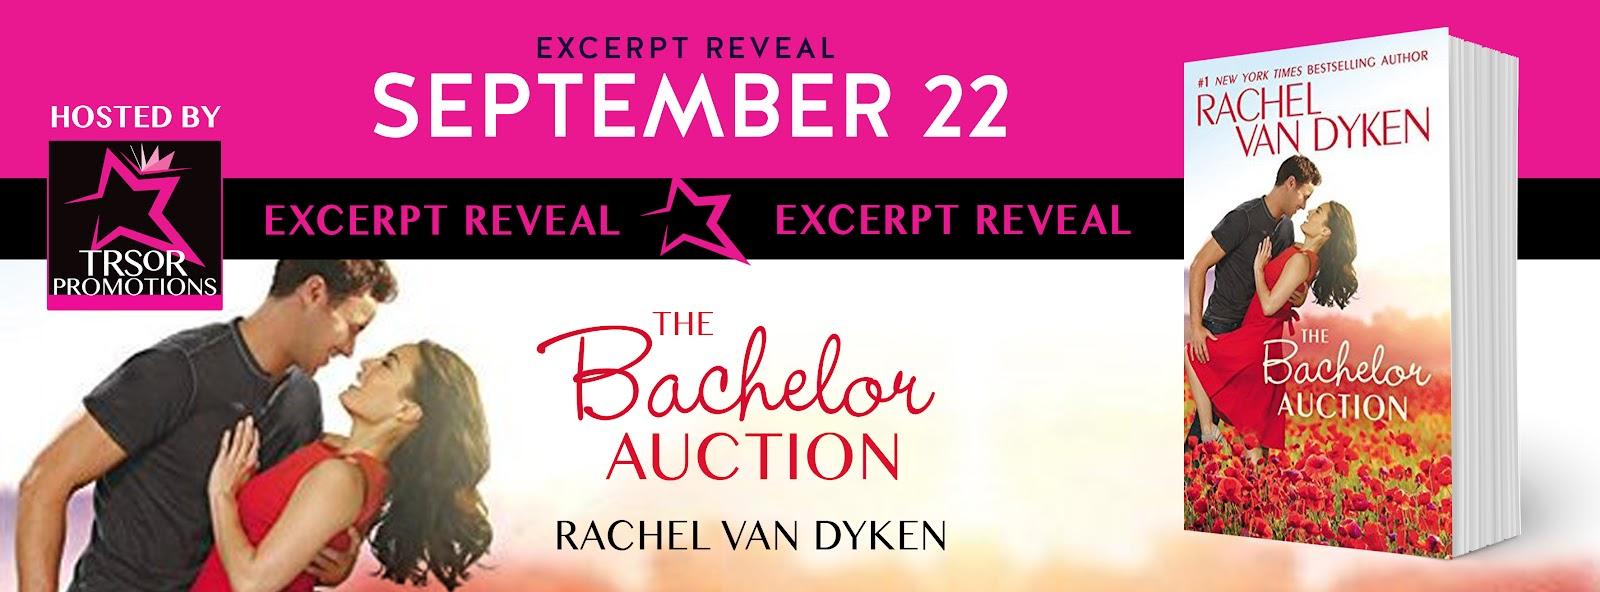 BACHELOR_AUCTION_EXCERPT.jpg